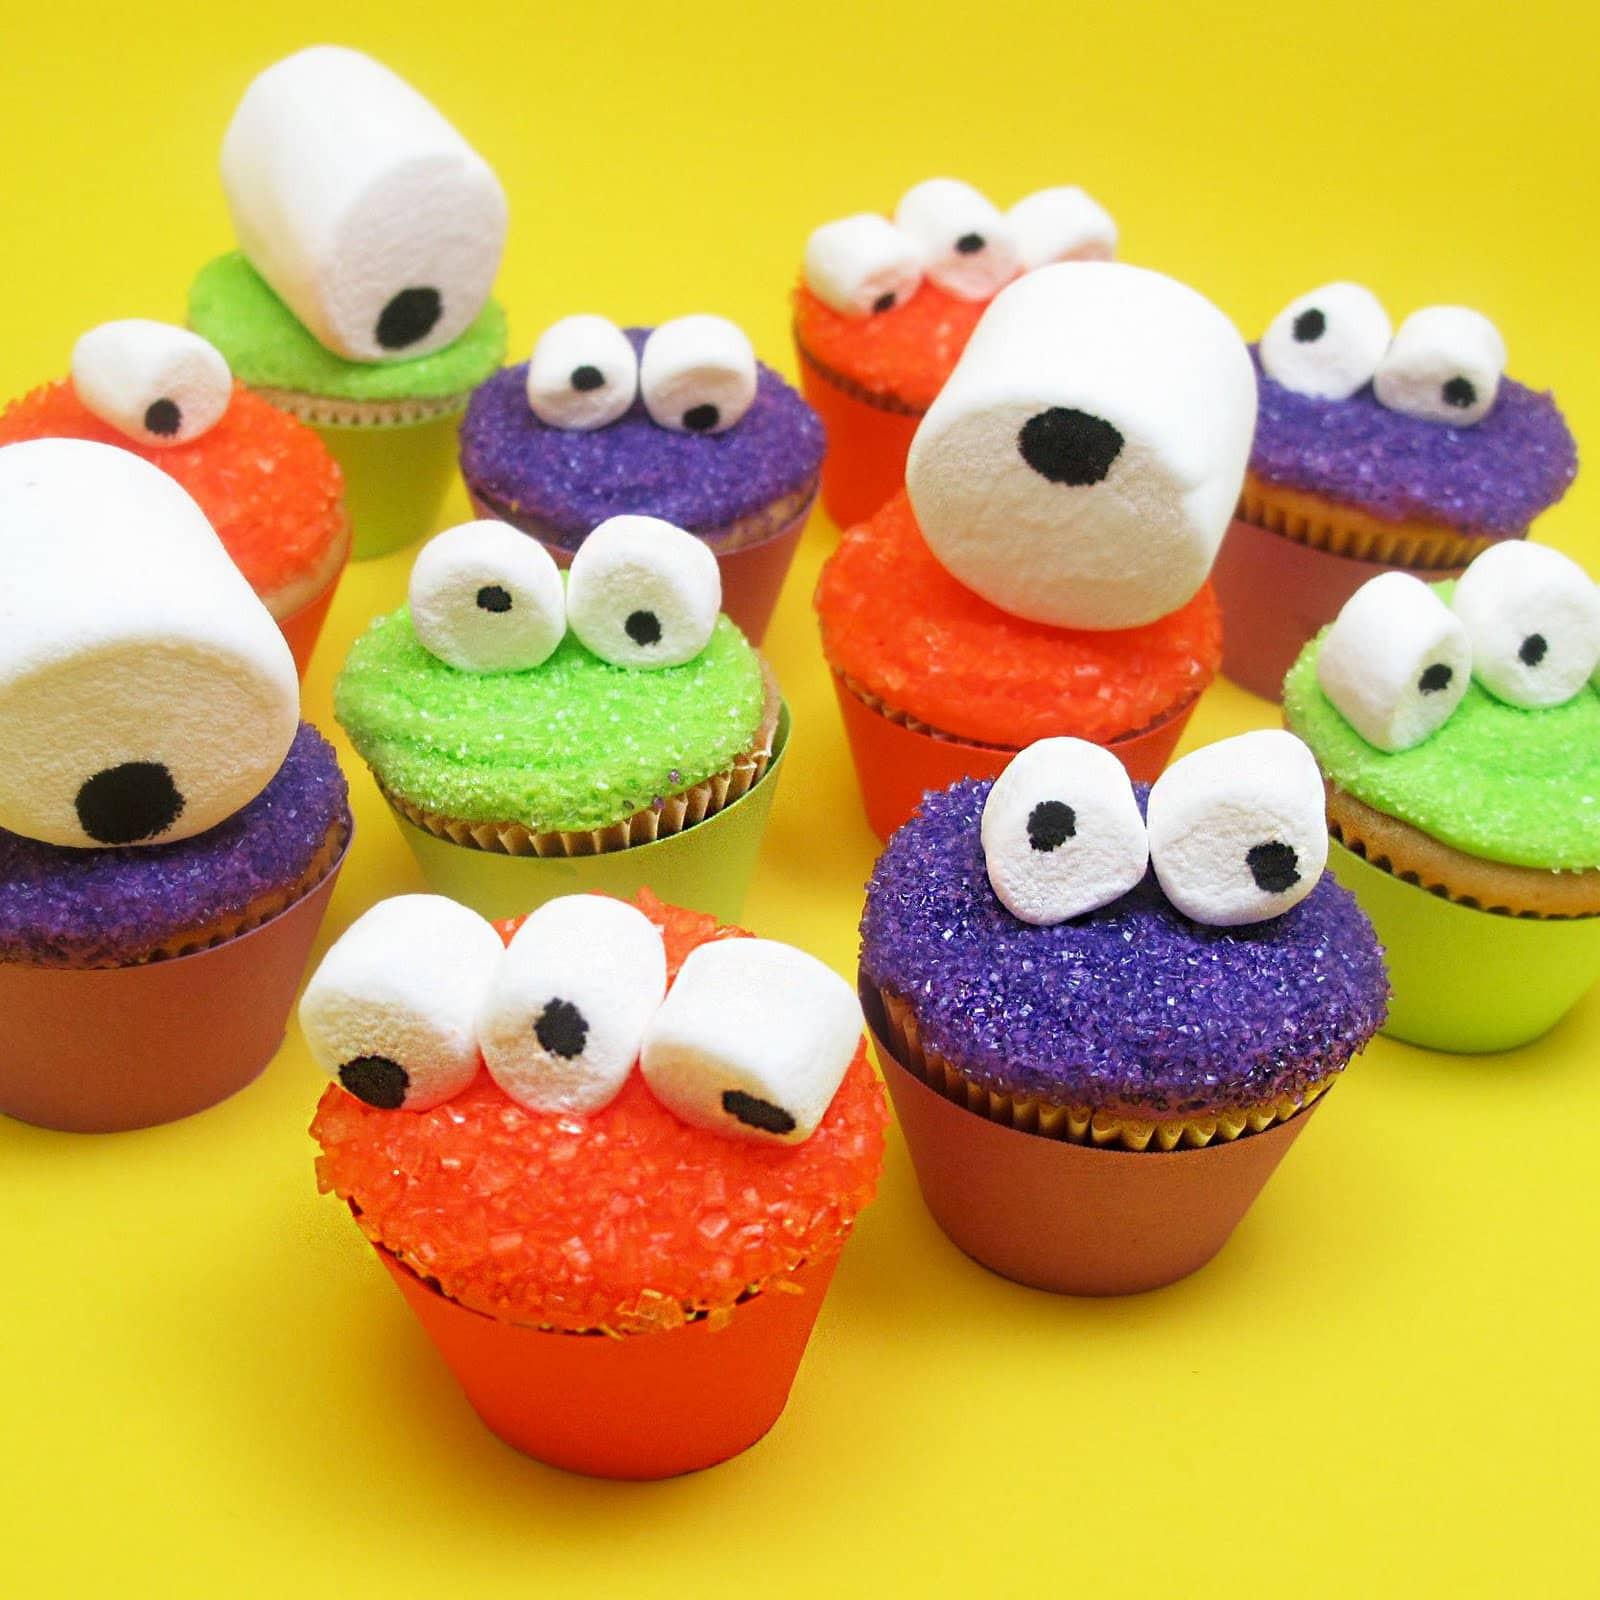 Mini Halloween Cupcakes  mini monster cupcakes for an easy Halloween treat idea